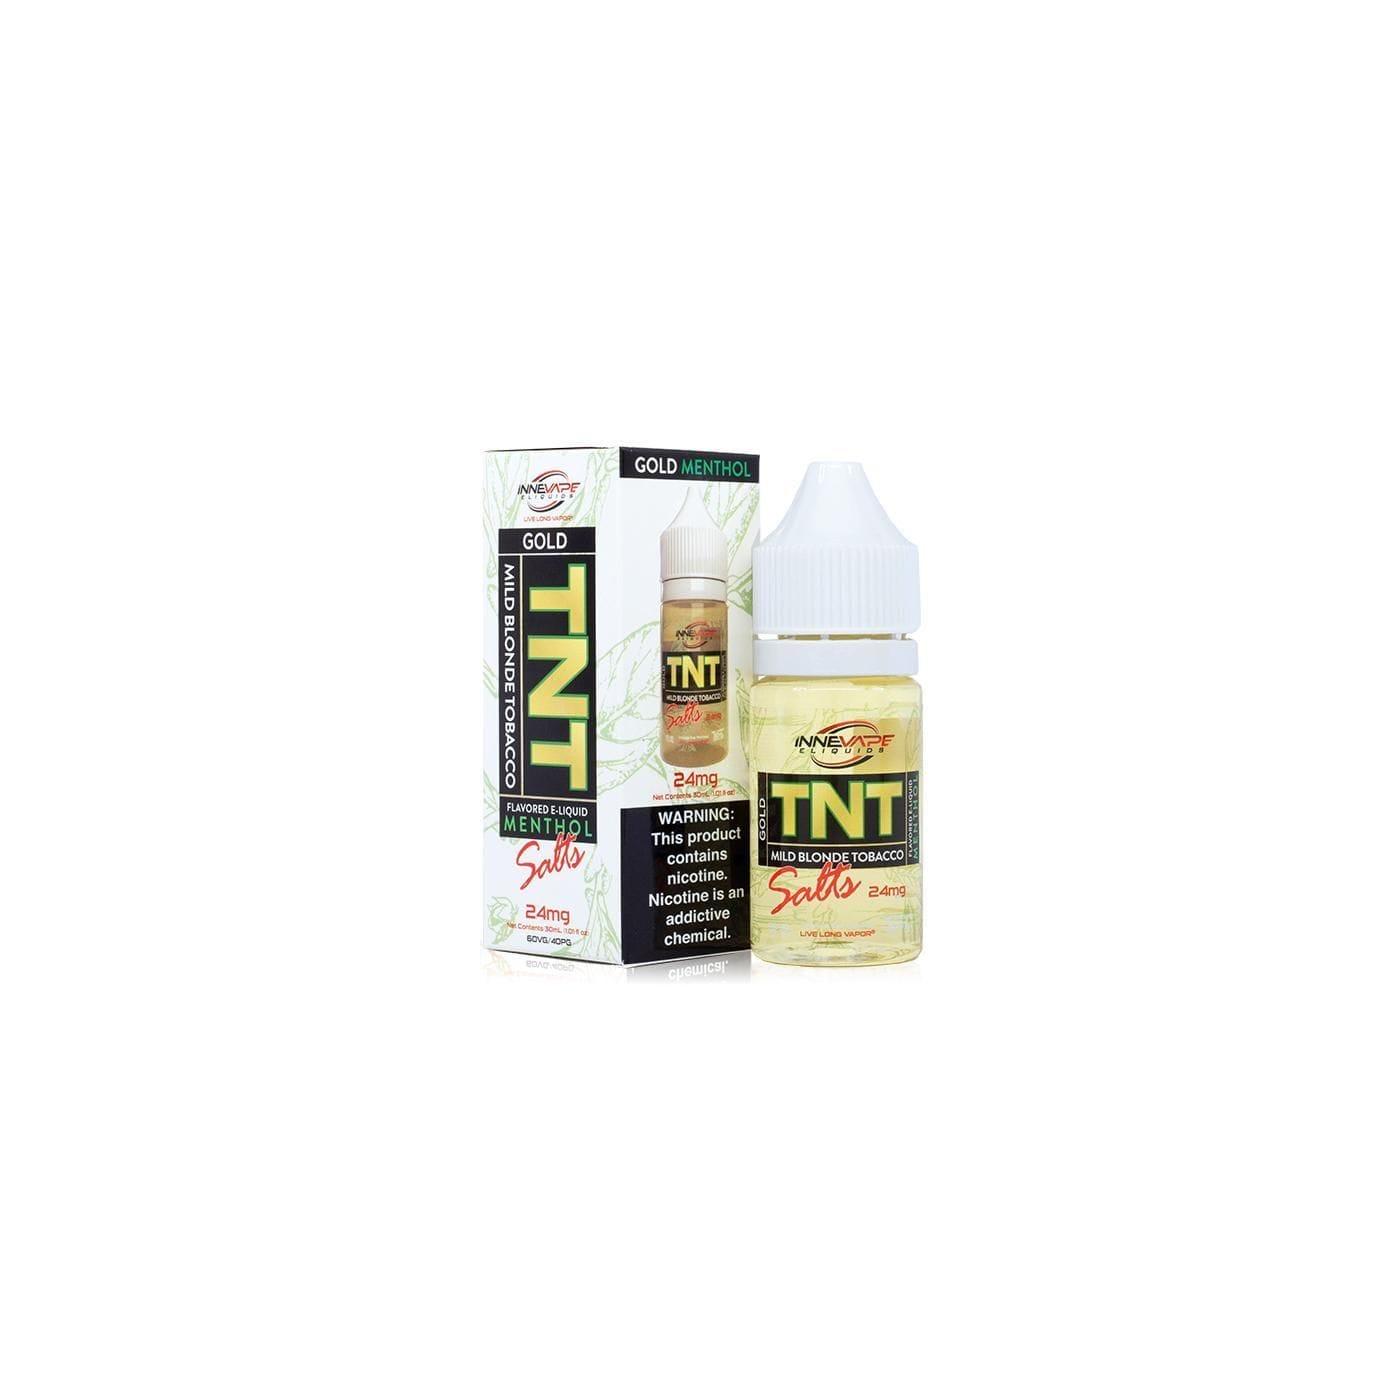 Innevape Salts TNT Gold Menthol